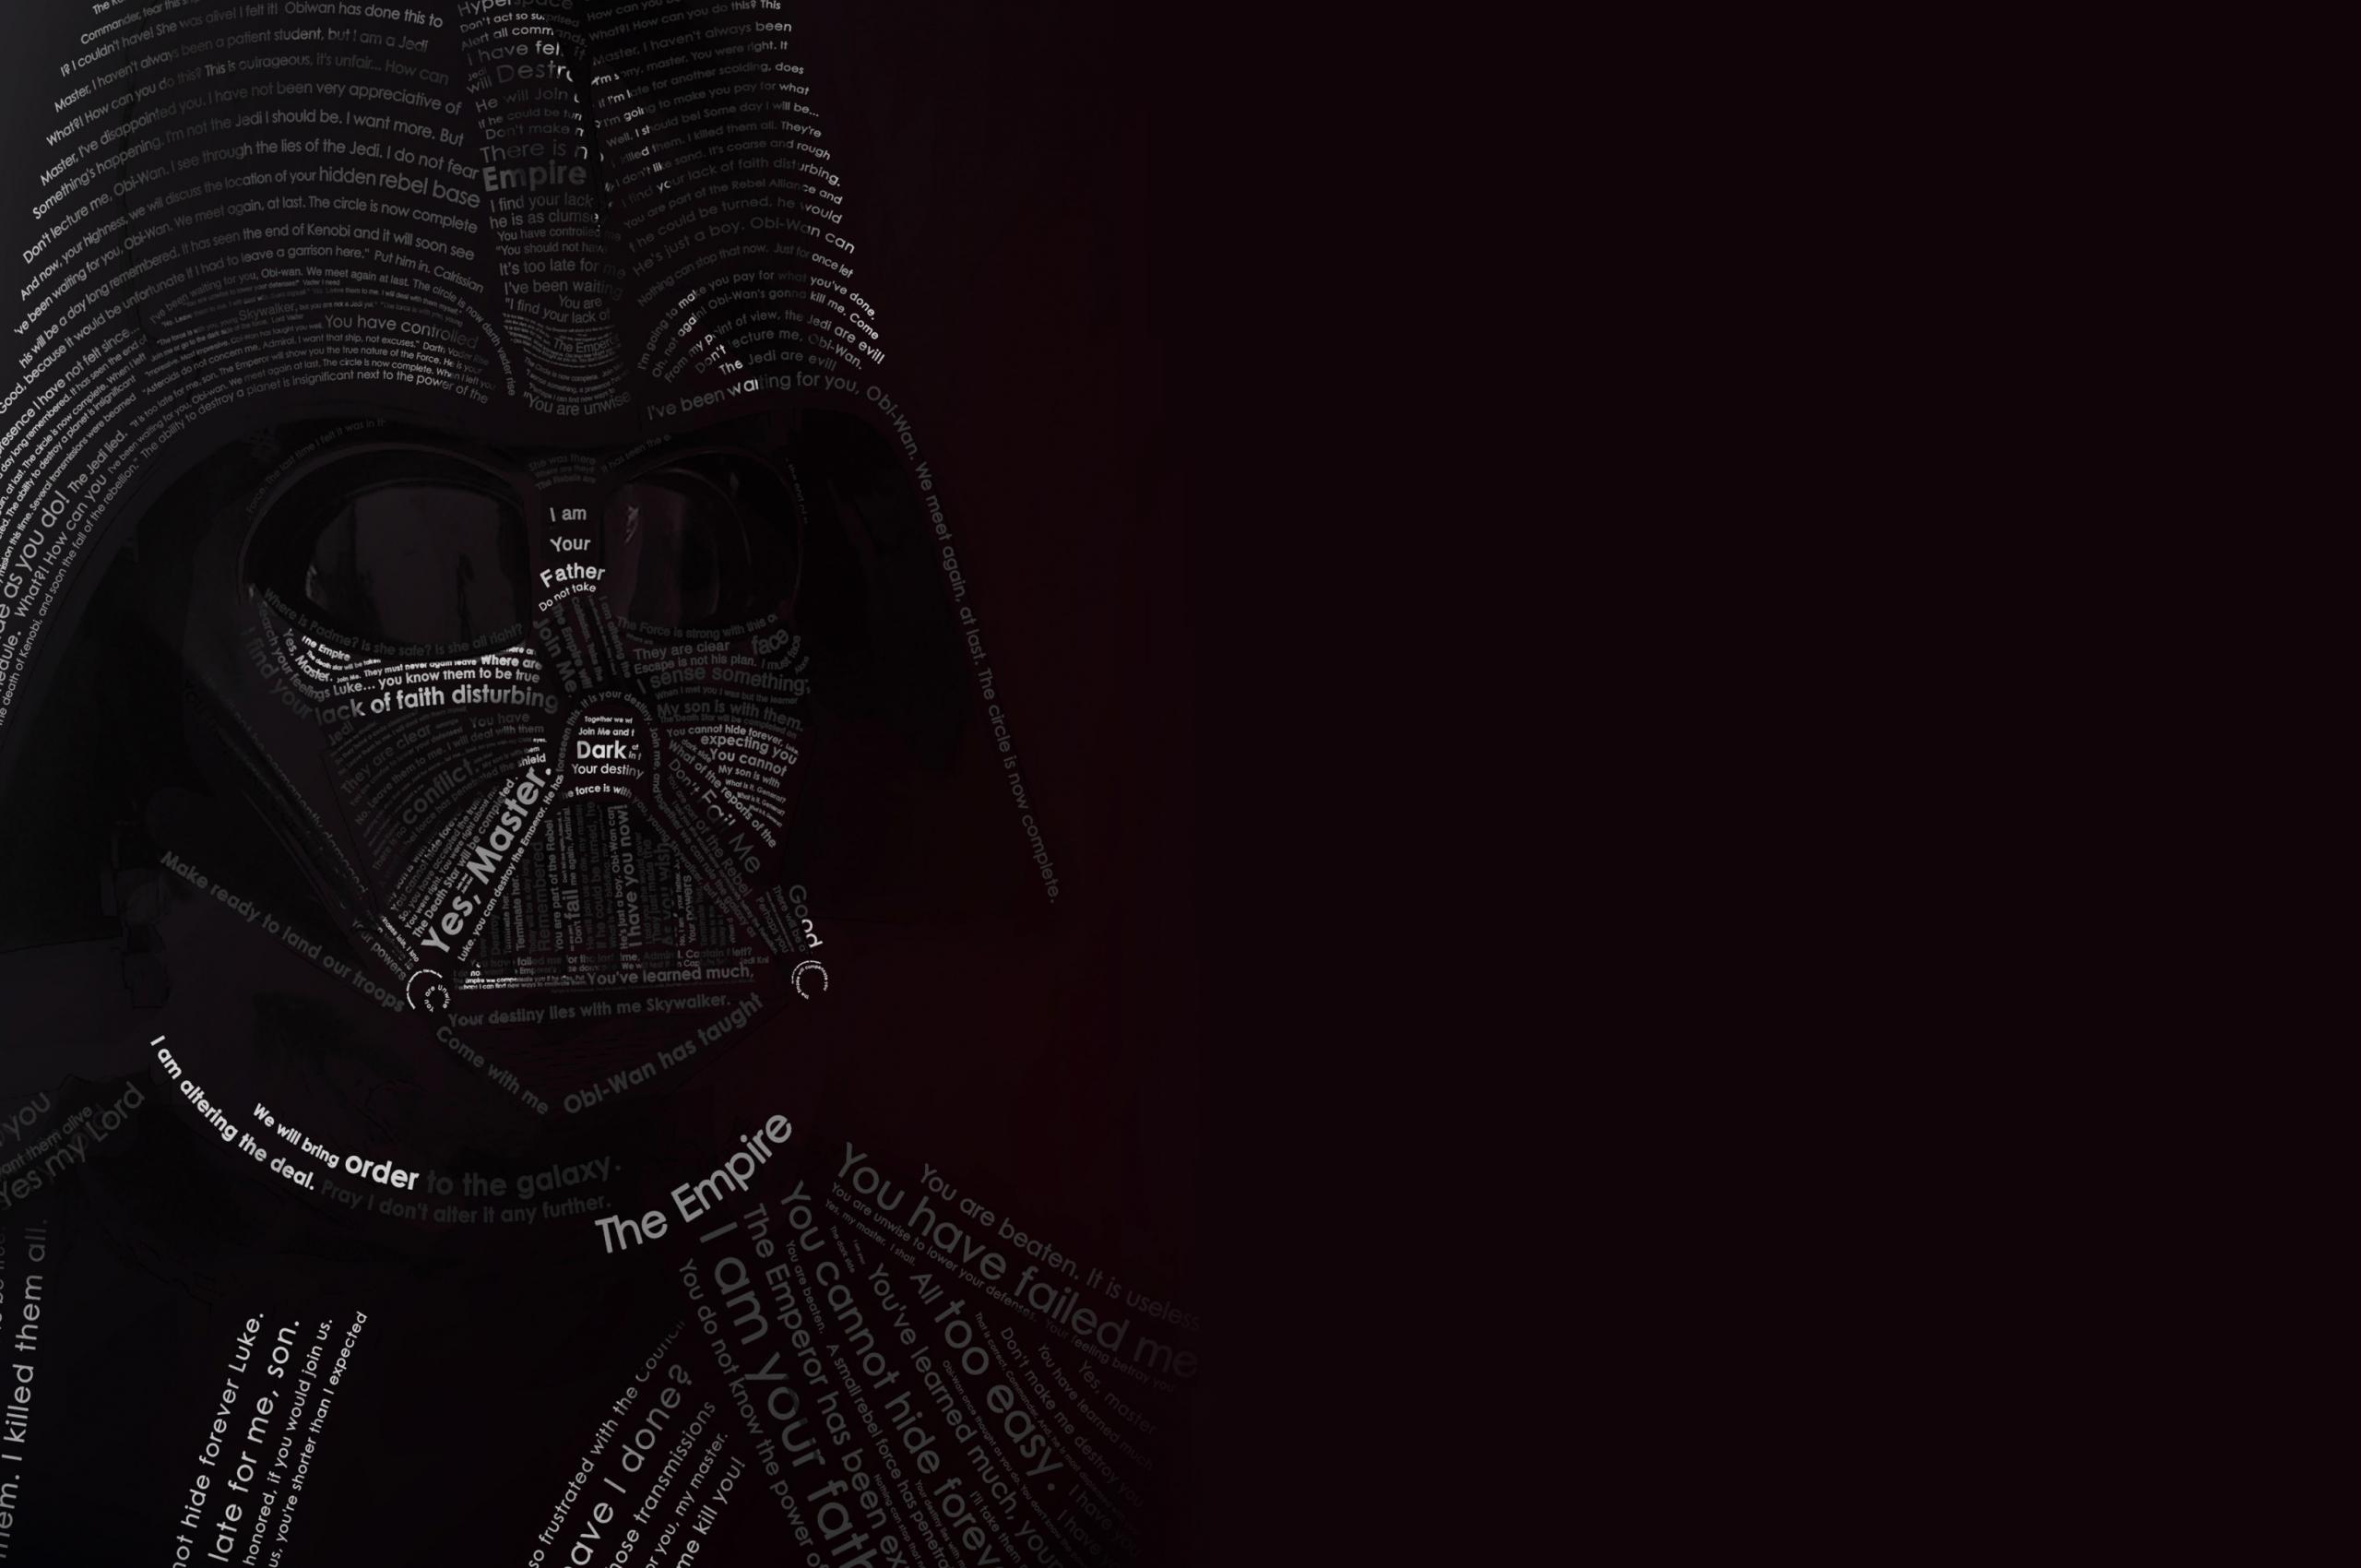 Free Download Darth Vader Typographic Portrait Wallpaper For